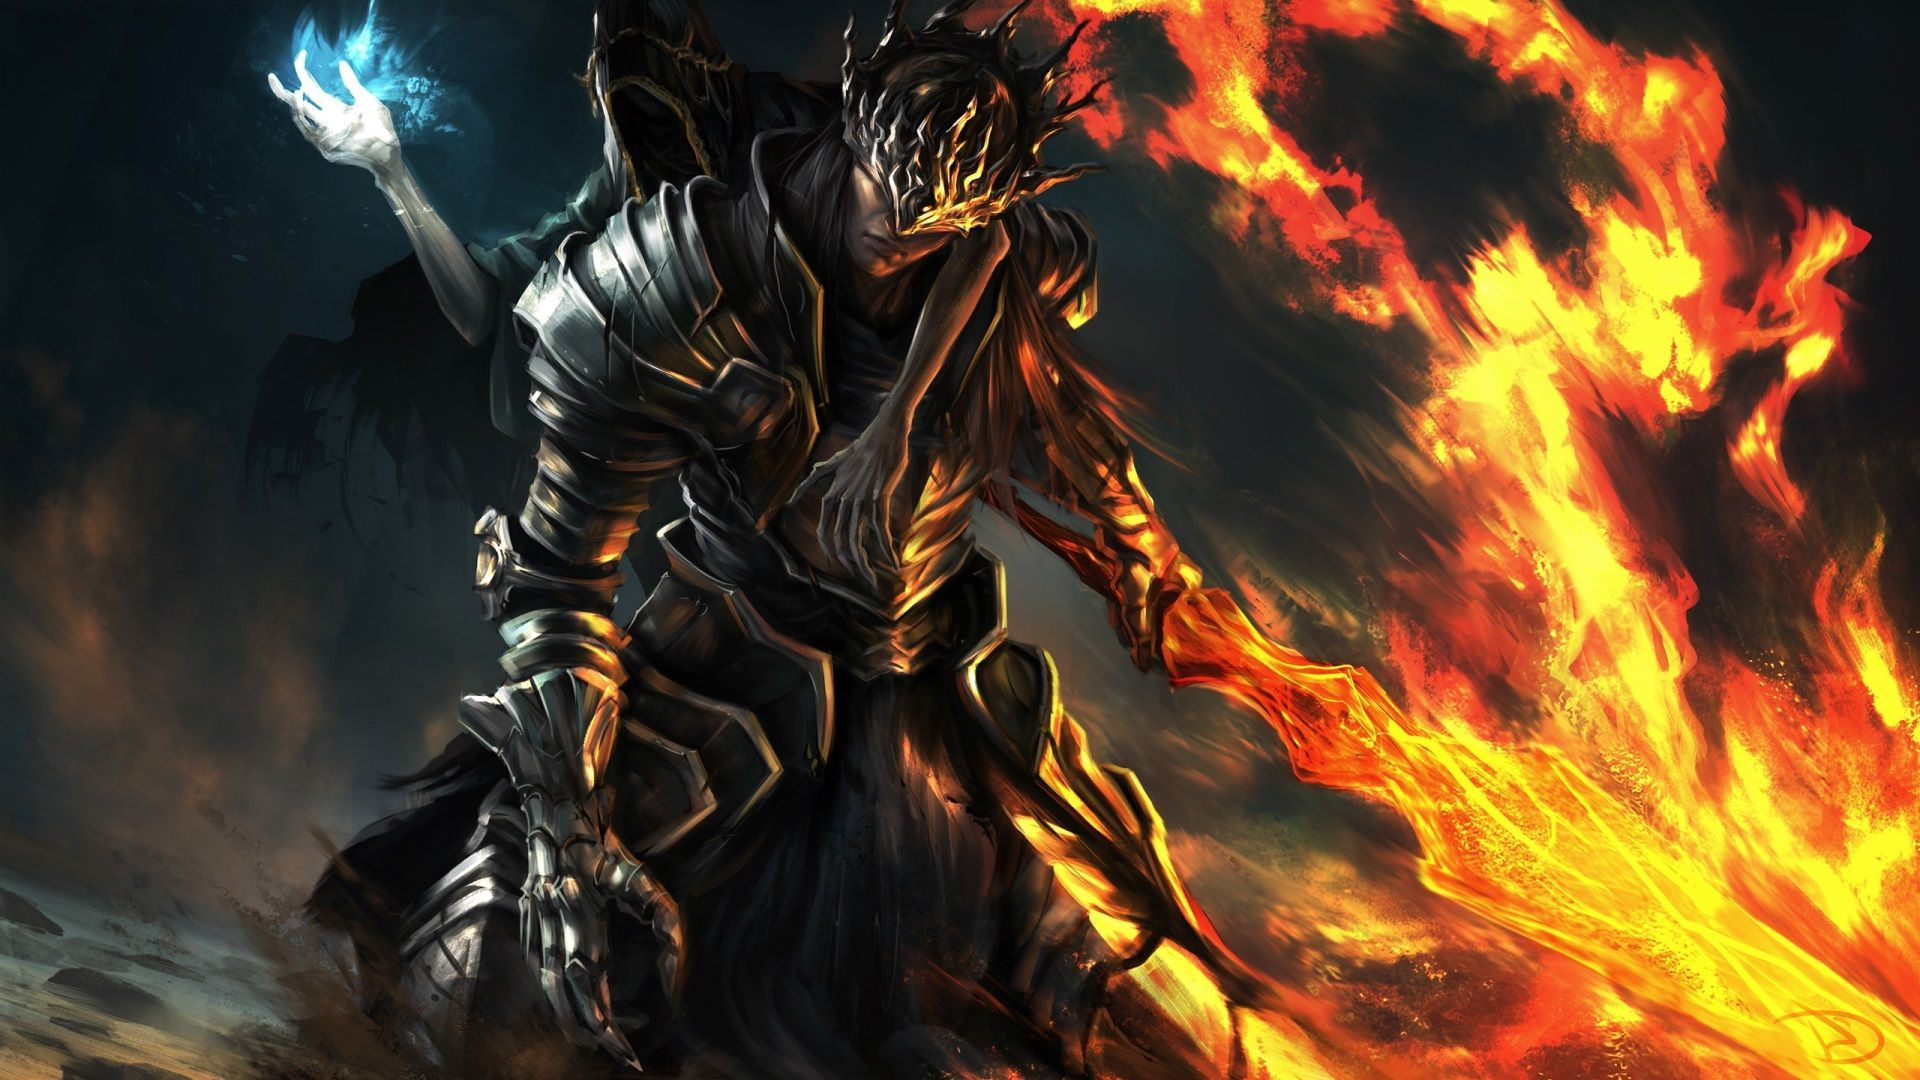 Dark Souls Abyss Watchers Wallpaper Posted By Ethan Peltier